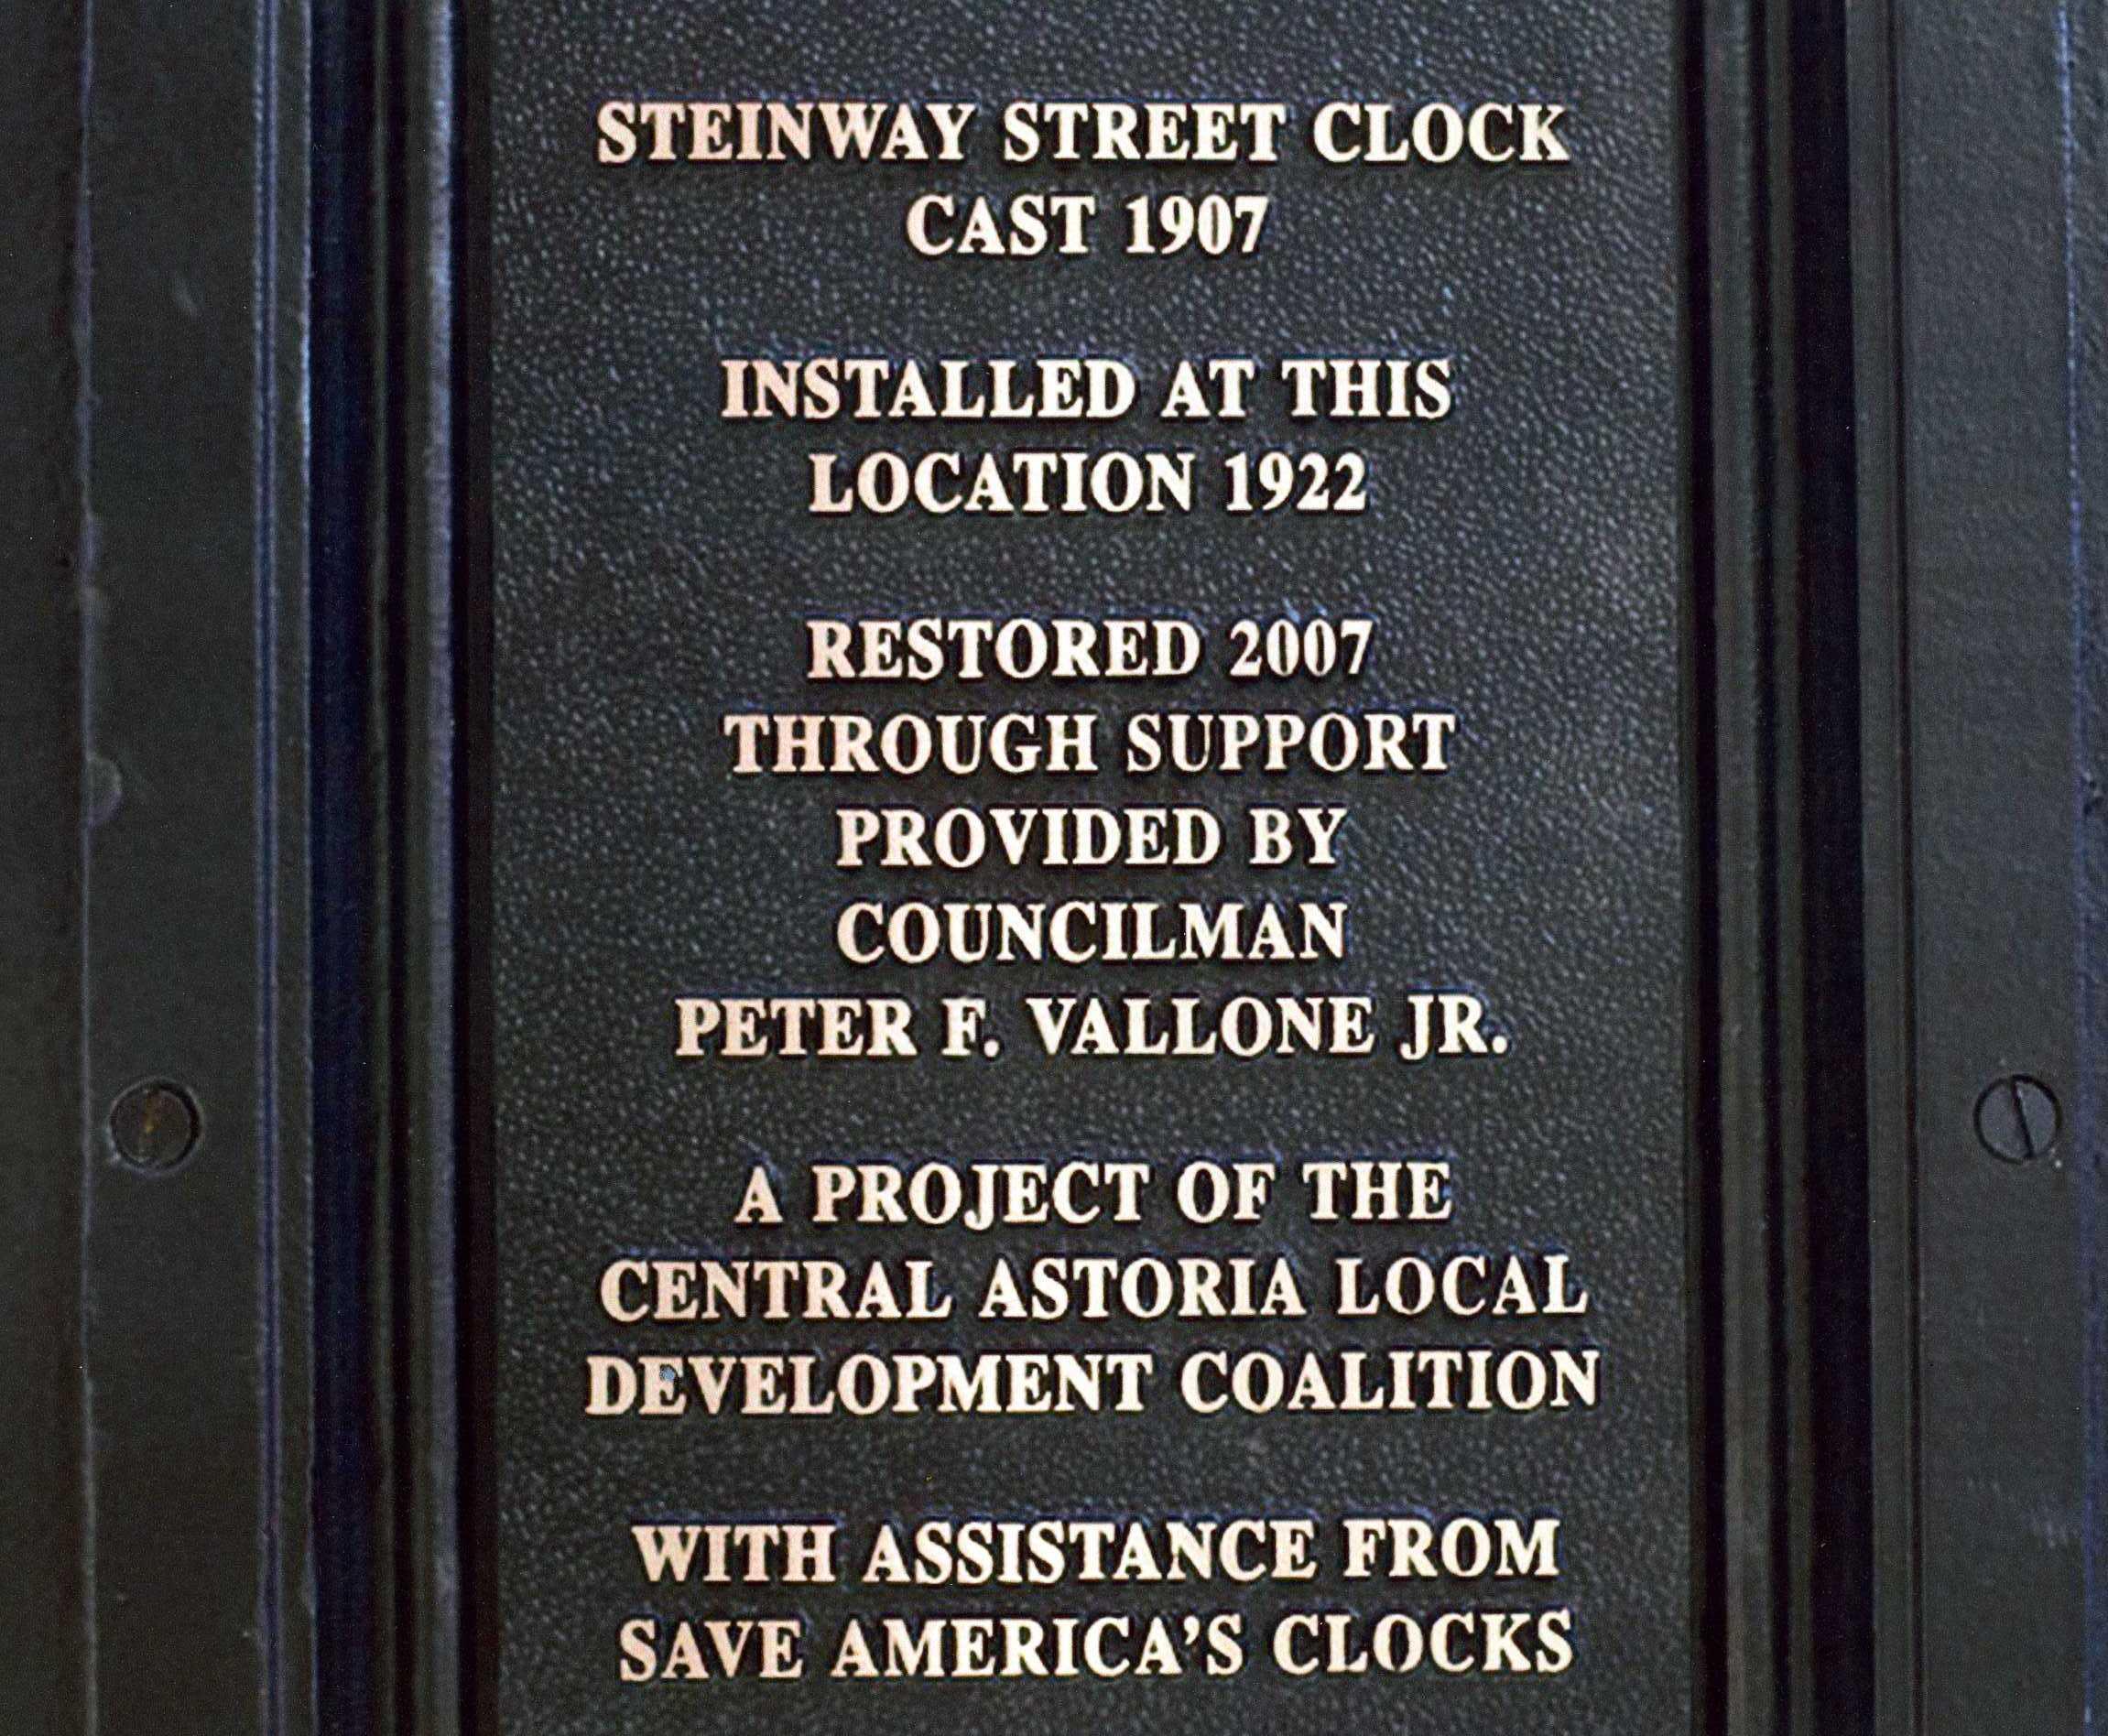 1-SAC_NYC_steinwayplaque314.jpg